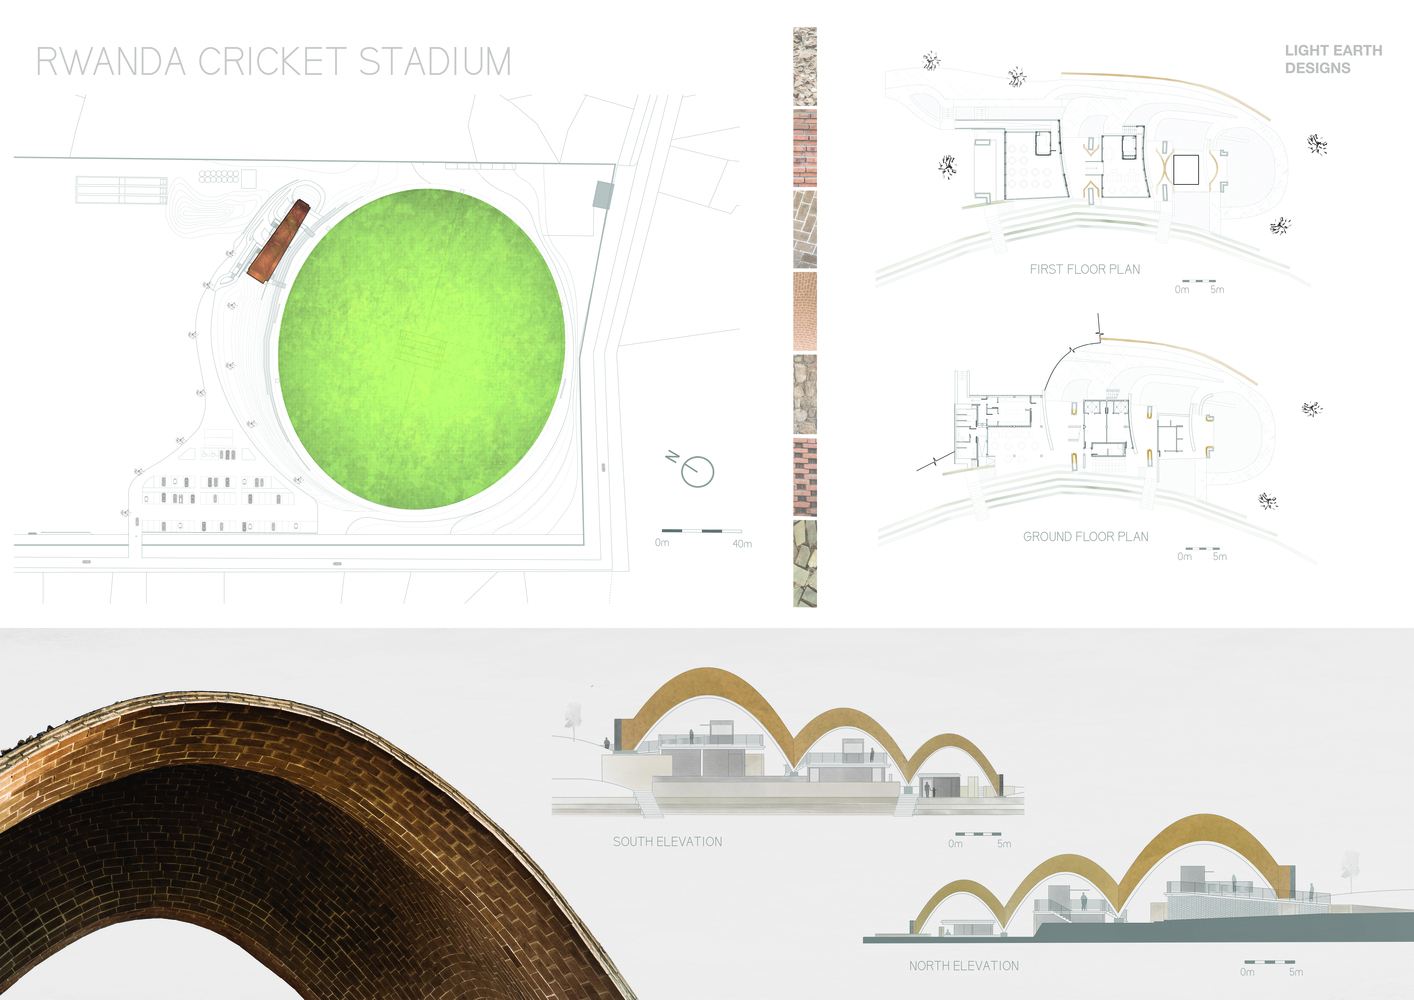 rwanda cricket stadium light earth designs [ 1414 x 1000 Pixel ]